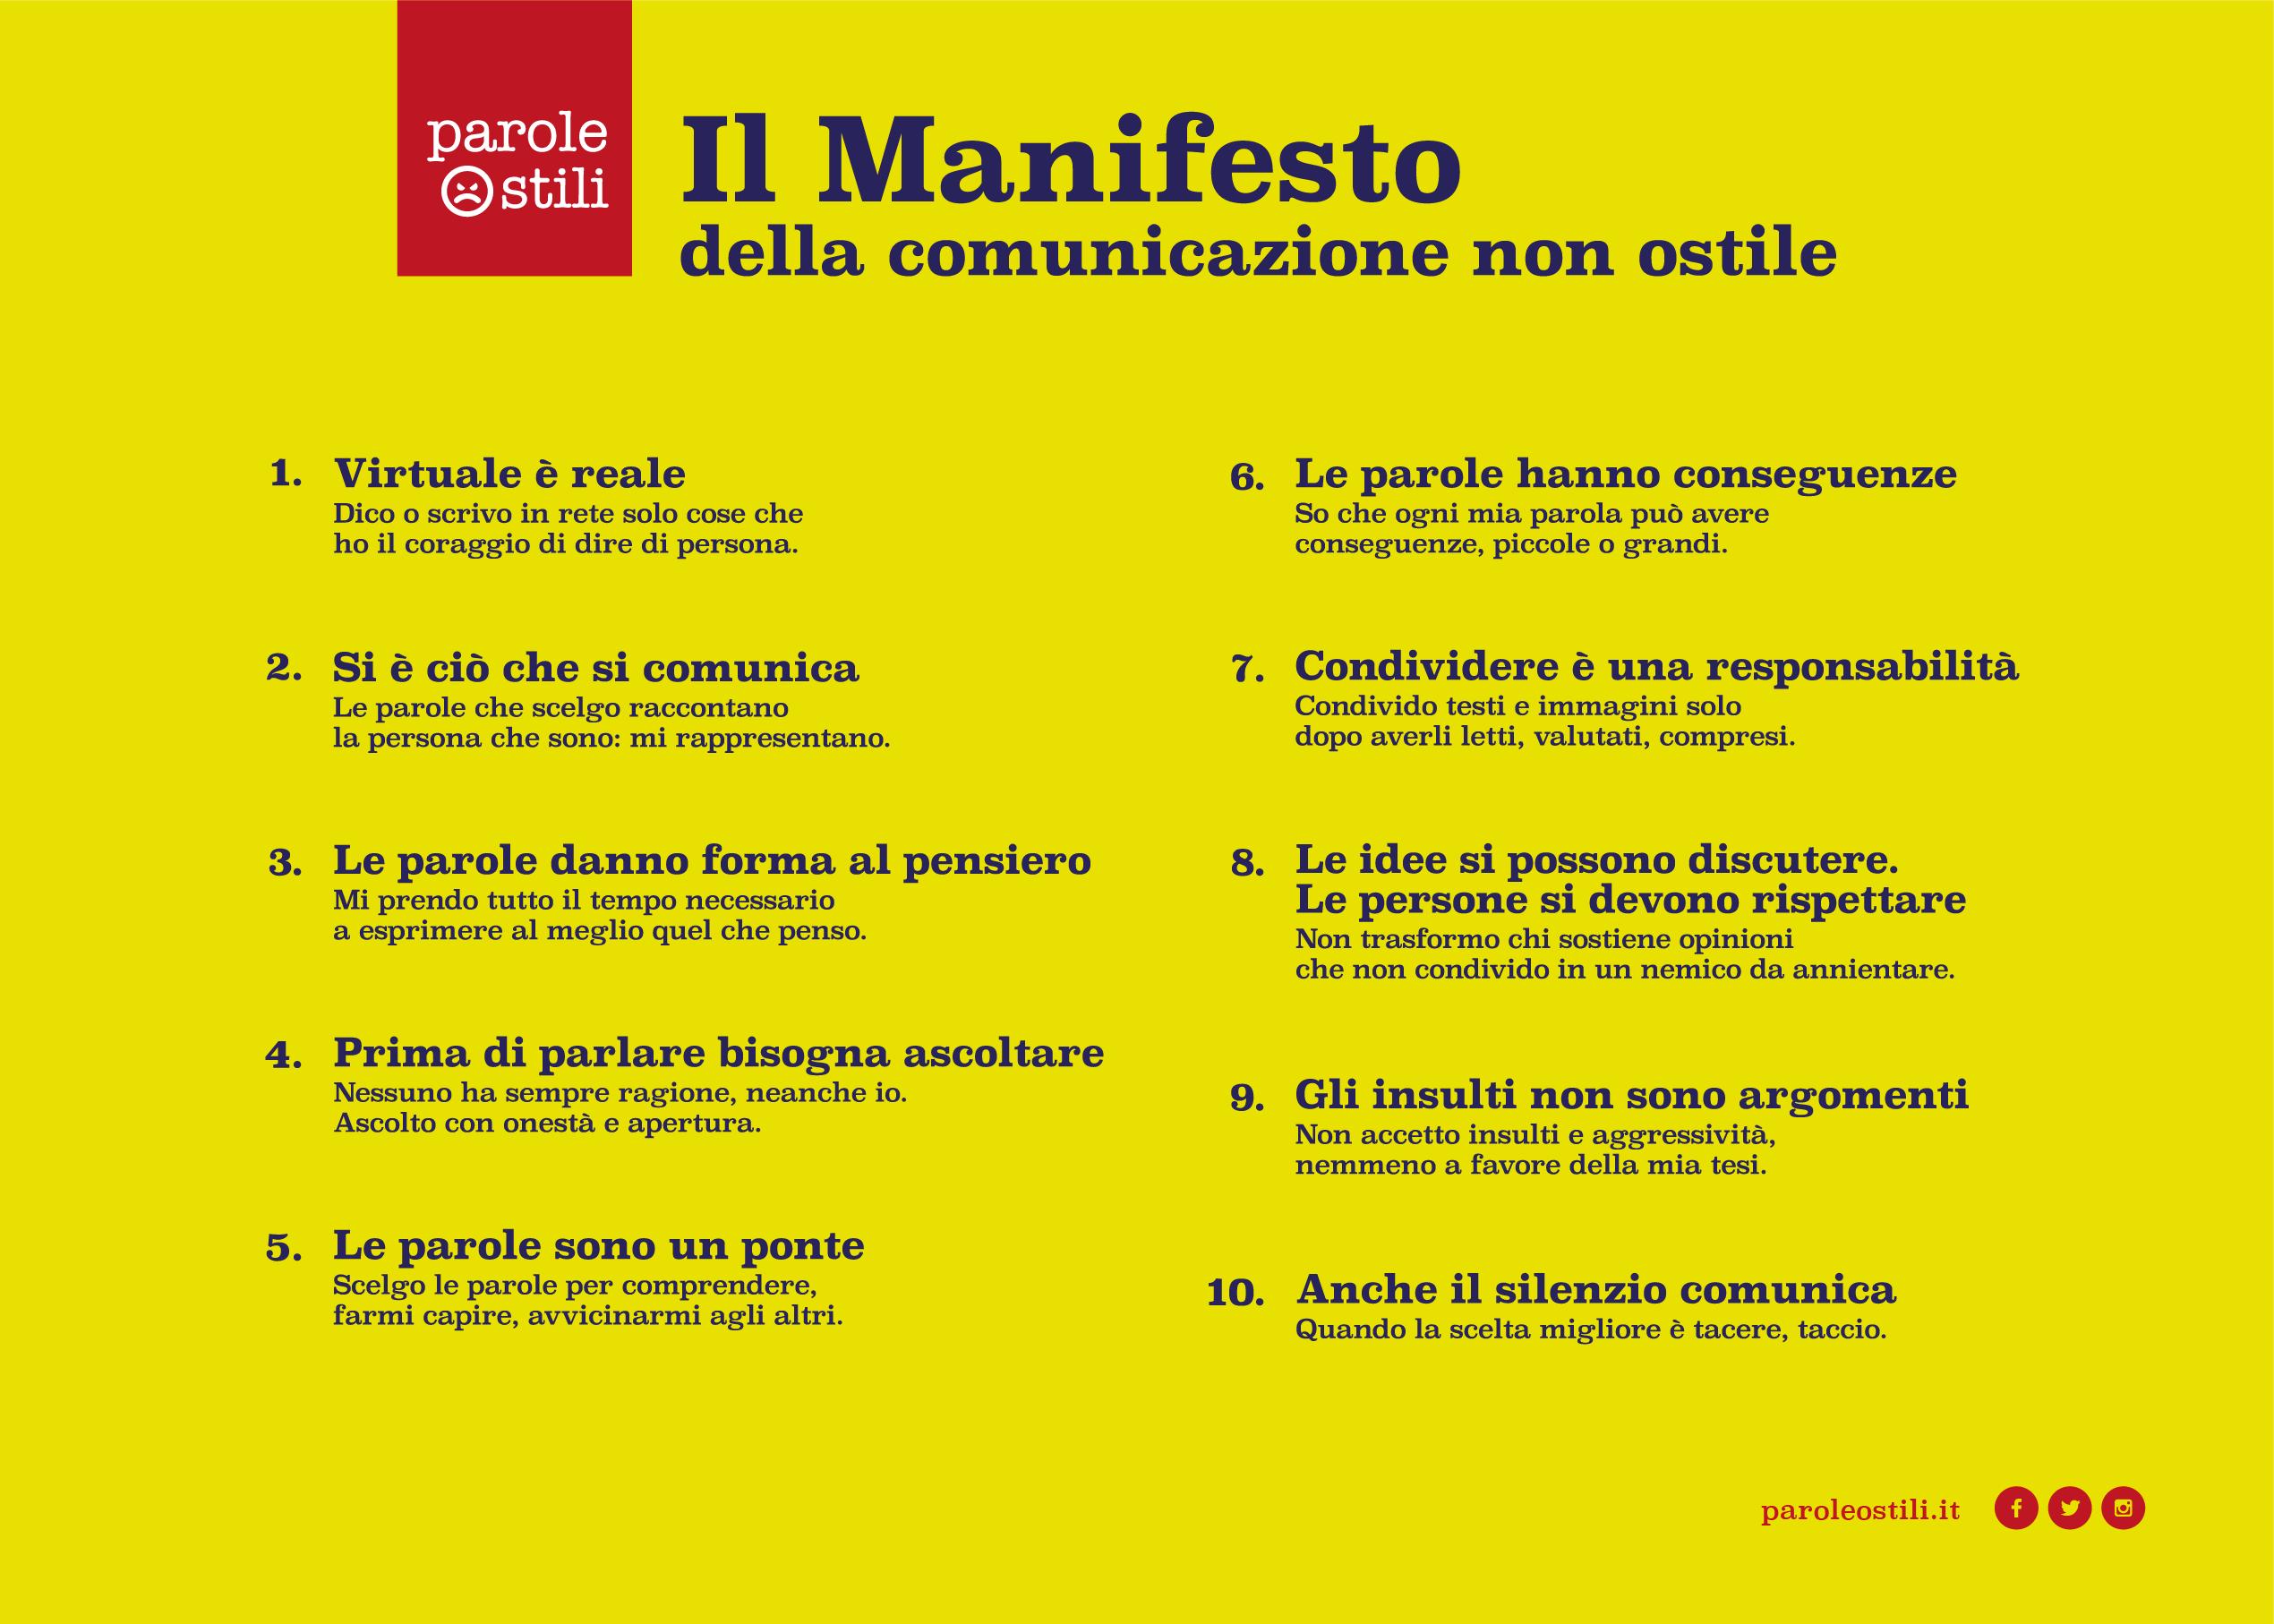 manifesto_parole_o_stili.png